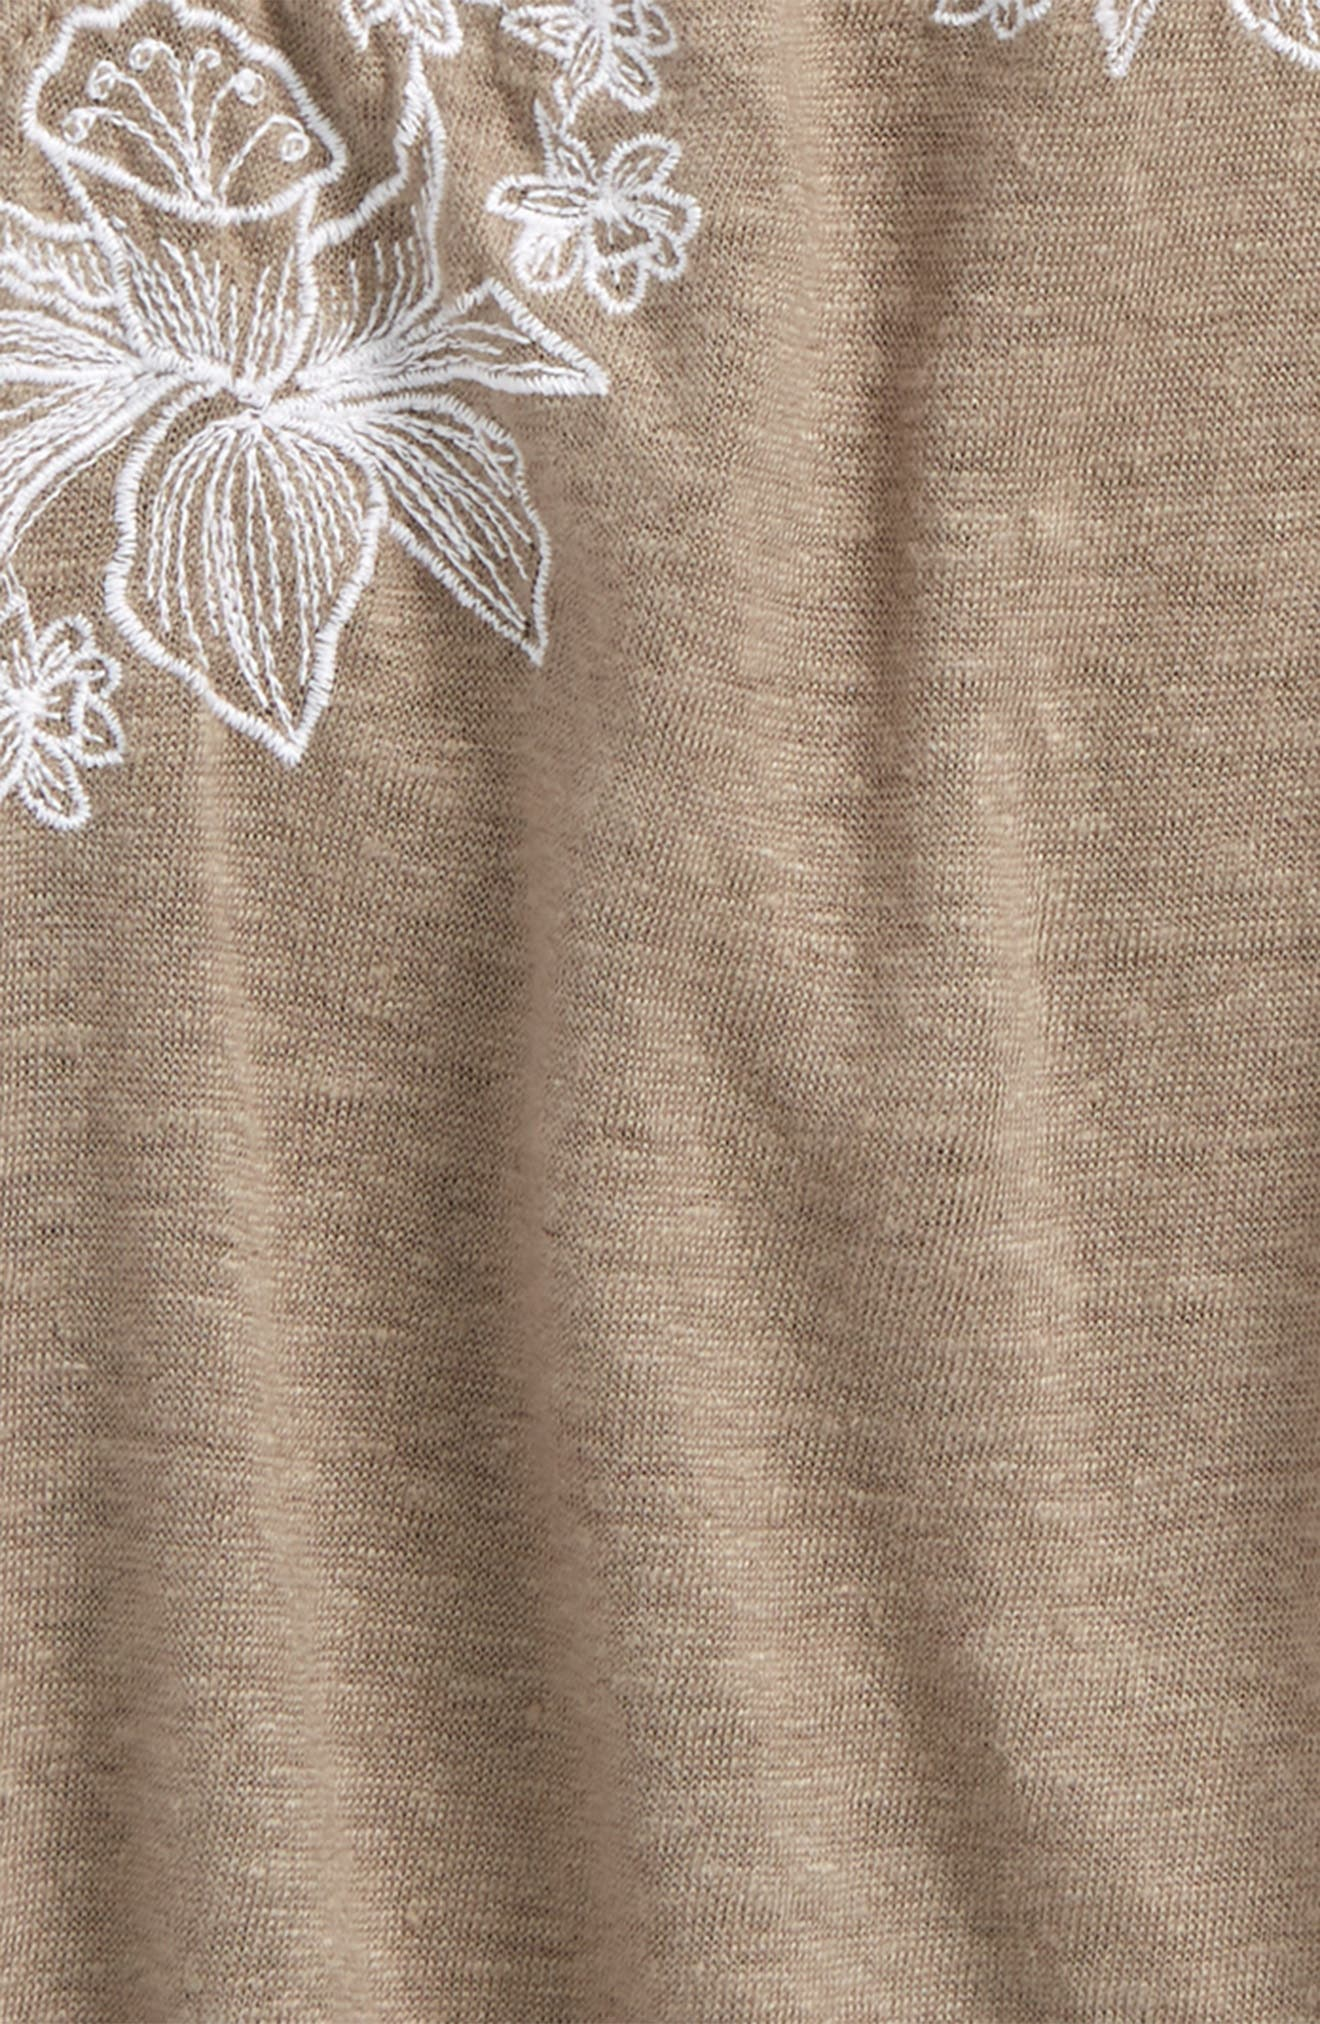 Sunlight One-Shoulder Top,                             Alternate thumbnail 2, color,                             Laurel Oak